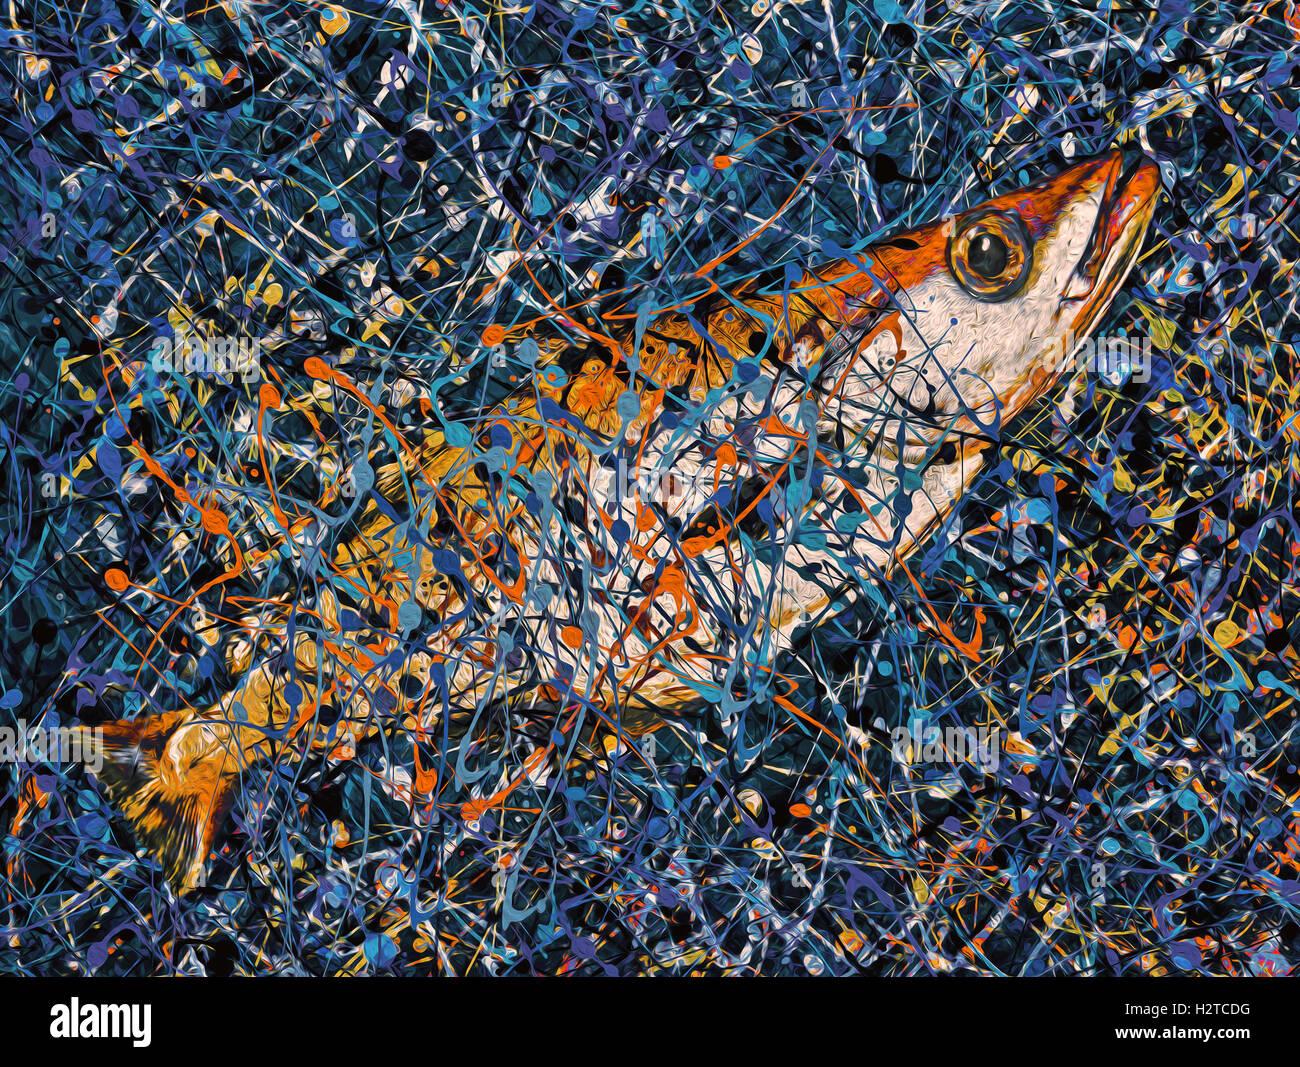 Jackson Pollock Pollock En Poisson Dans Un Dribble Peinture Hommage A La Fin De Jackson Pollock Photo Stock Alamy